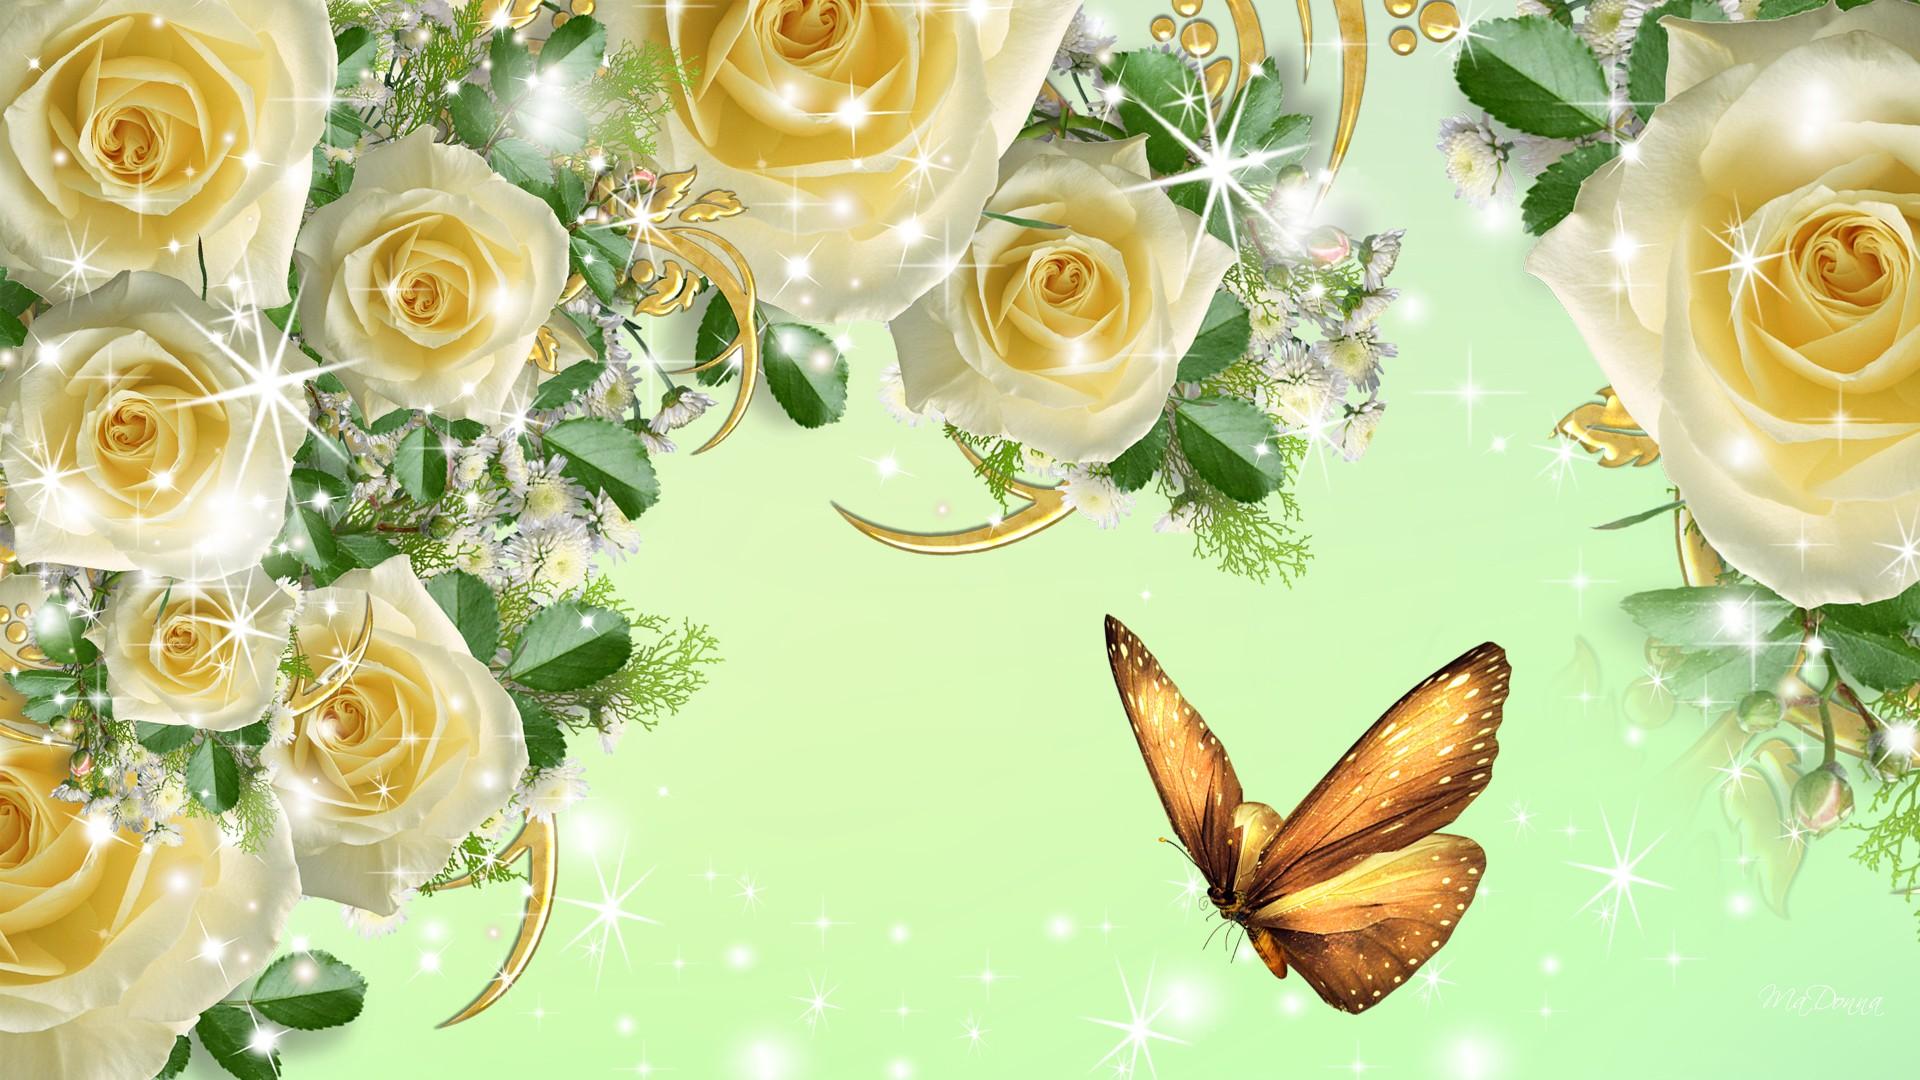 Beautiful Yellow Rose Wallpaper Images Free Download 1920x1080